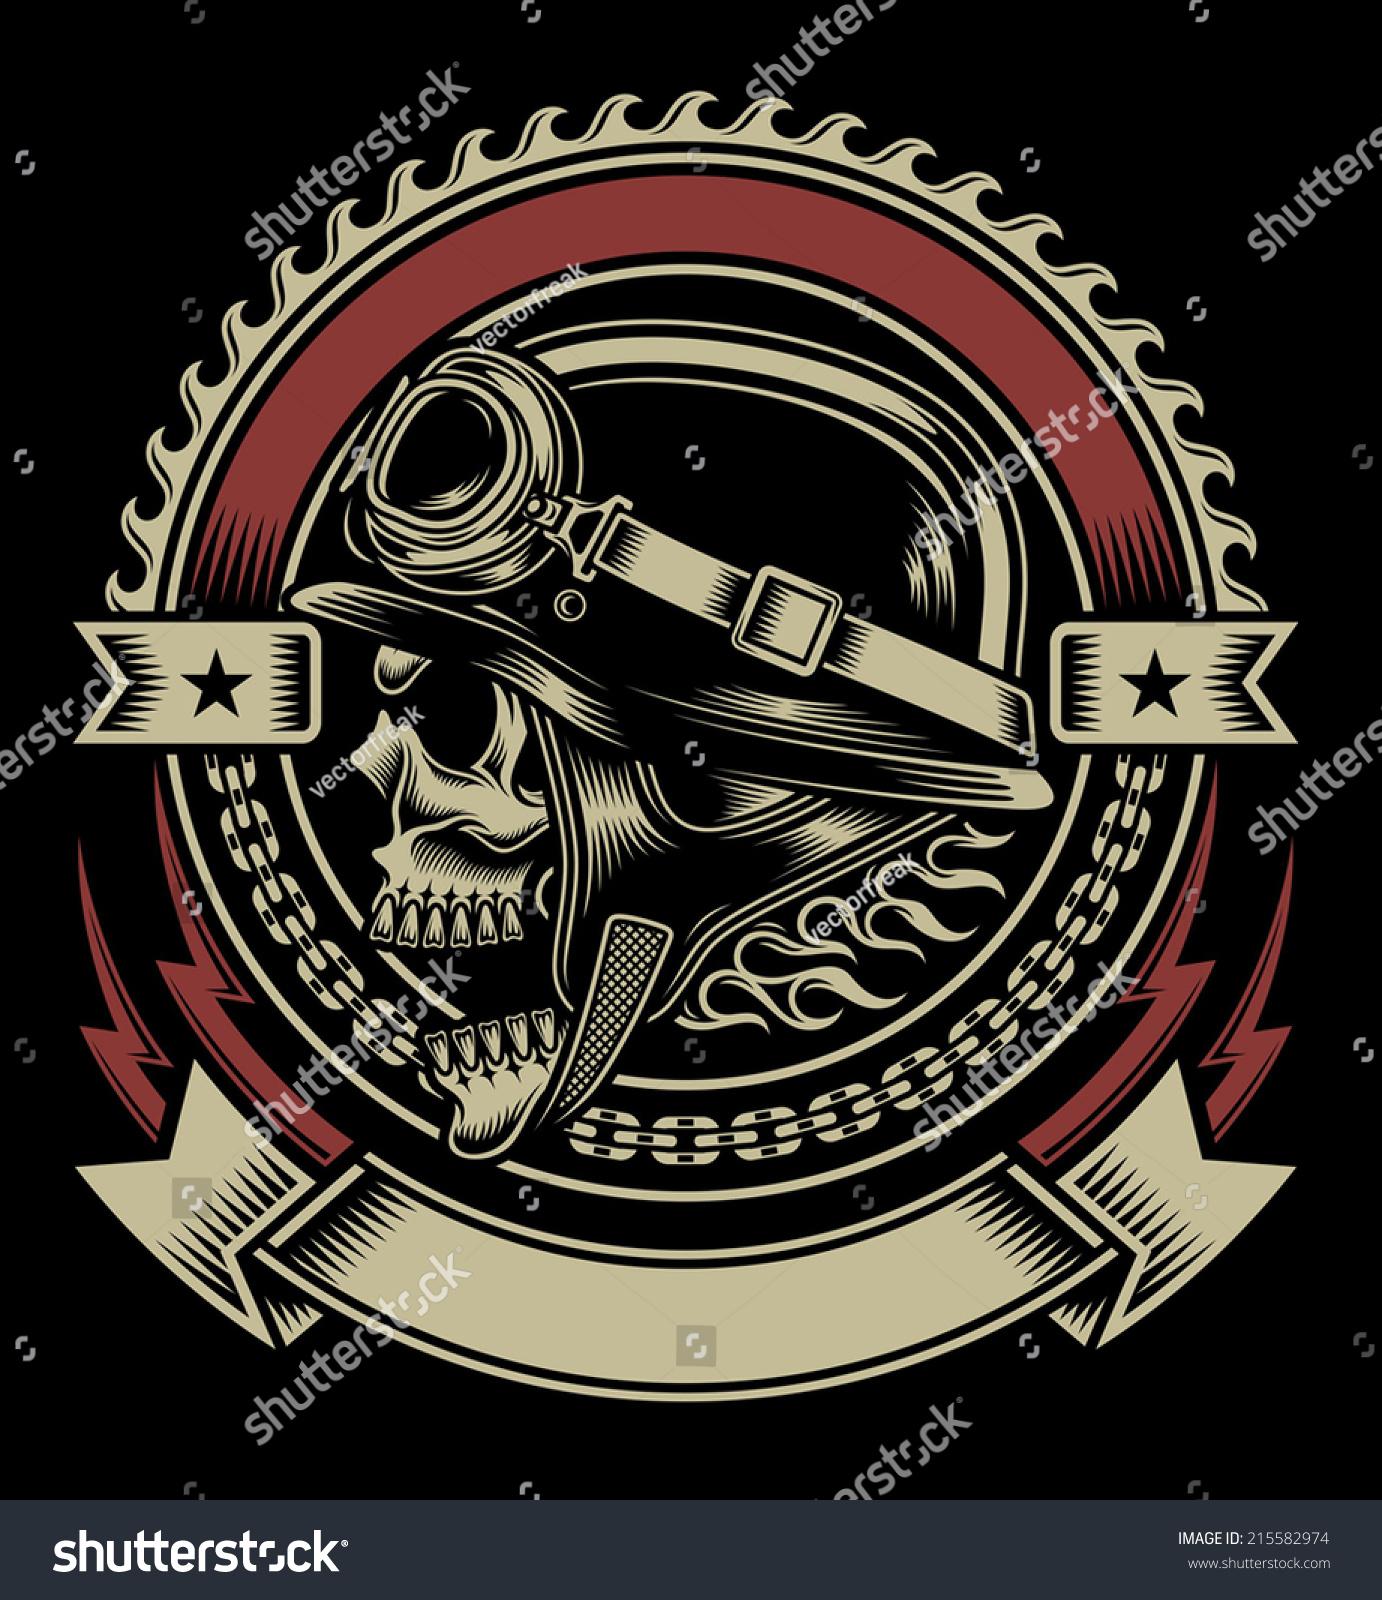 danza kuduro mp3 free download skull